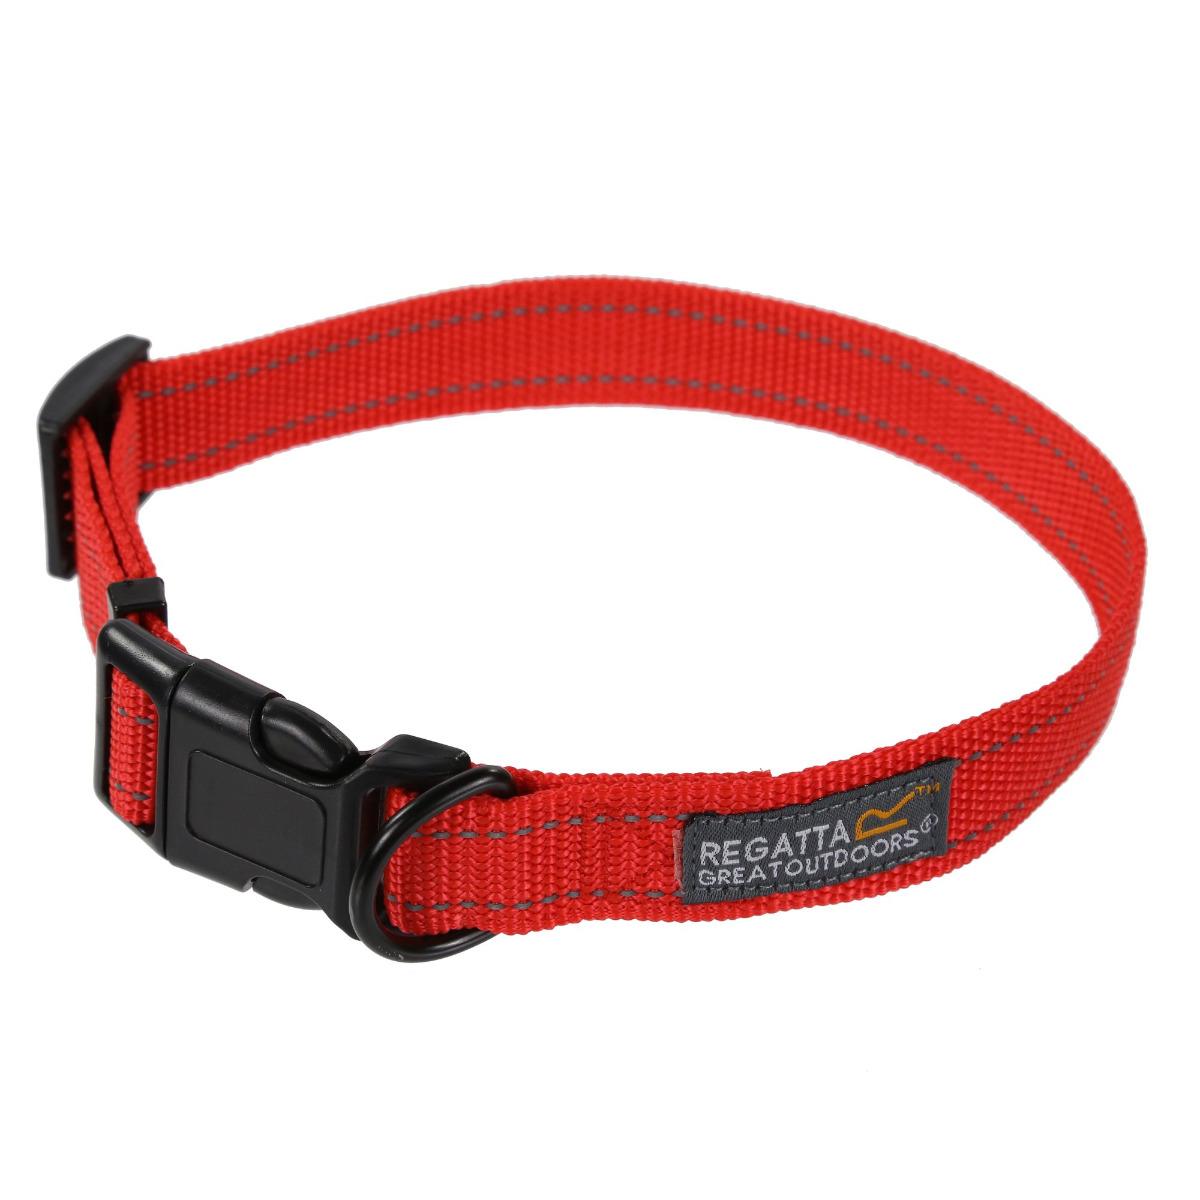 Regatta Comfort Dog Collar - Red - 45 - 70